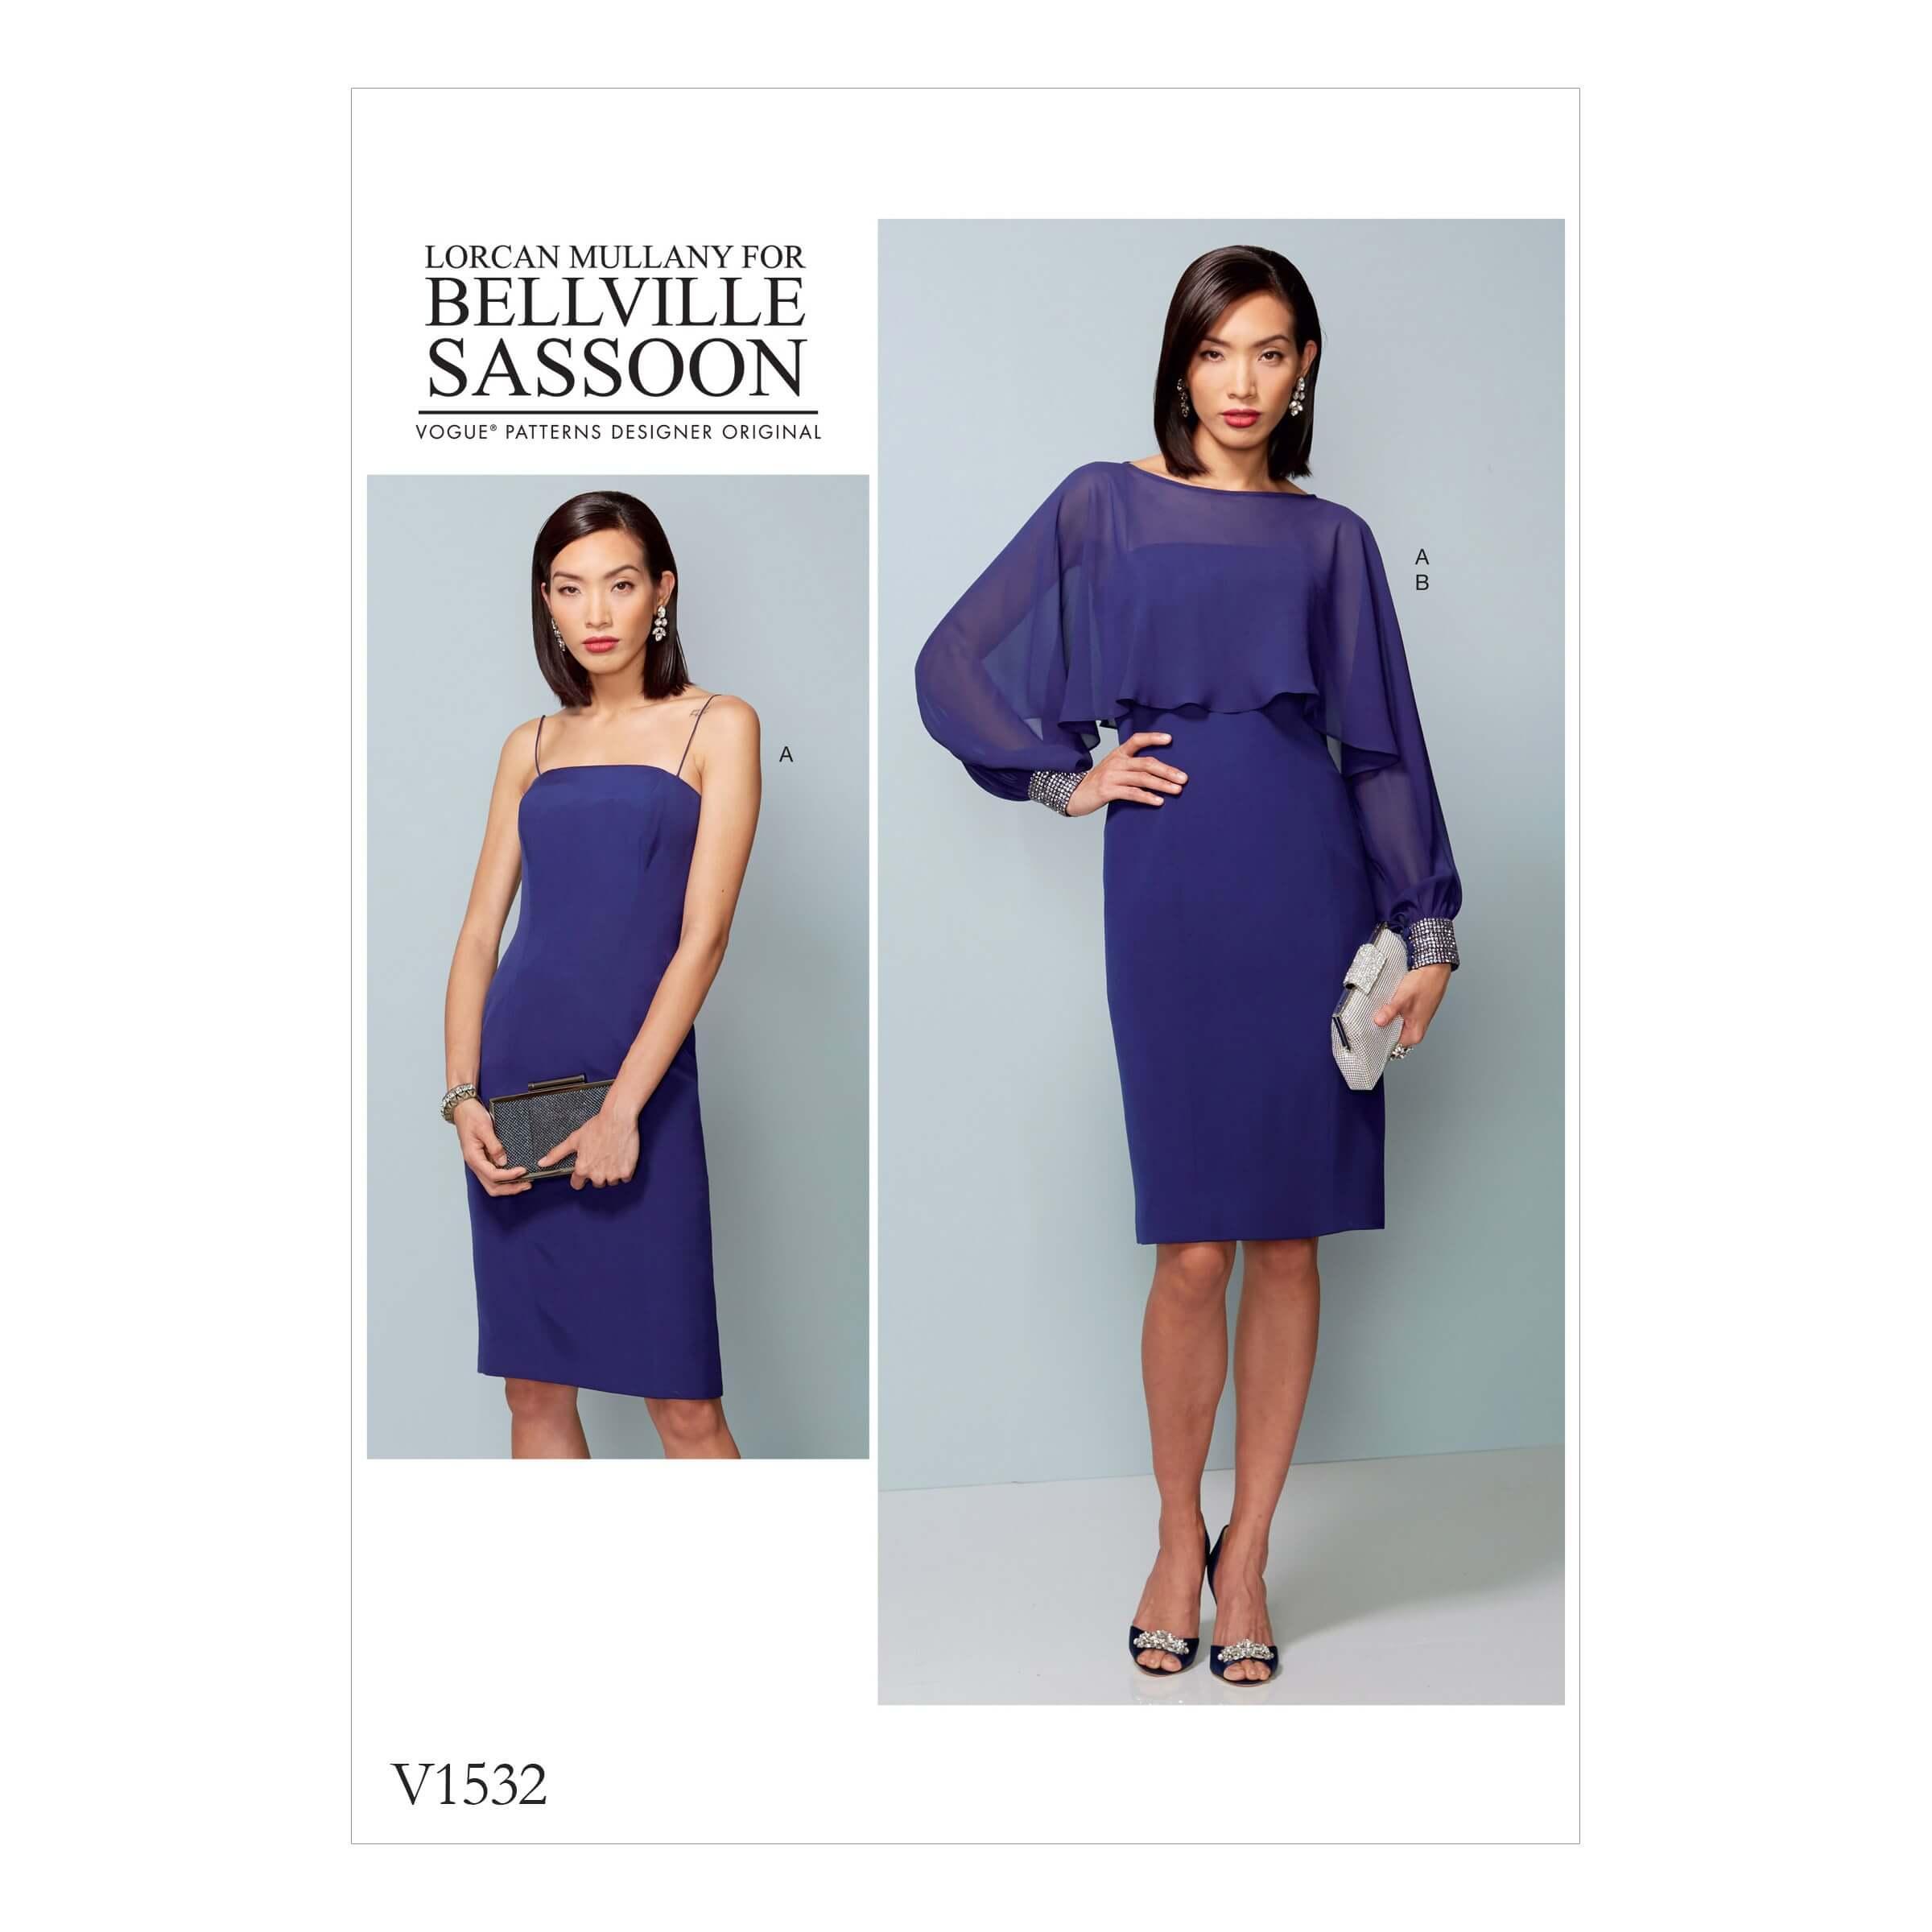 Vogue Sewing Pattern V1532 Women's Slip Dress and Embellished Cover Up